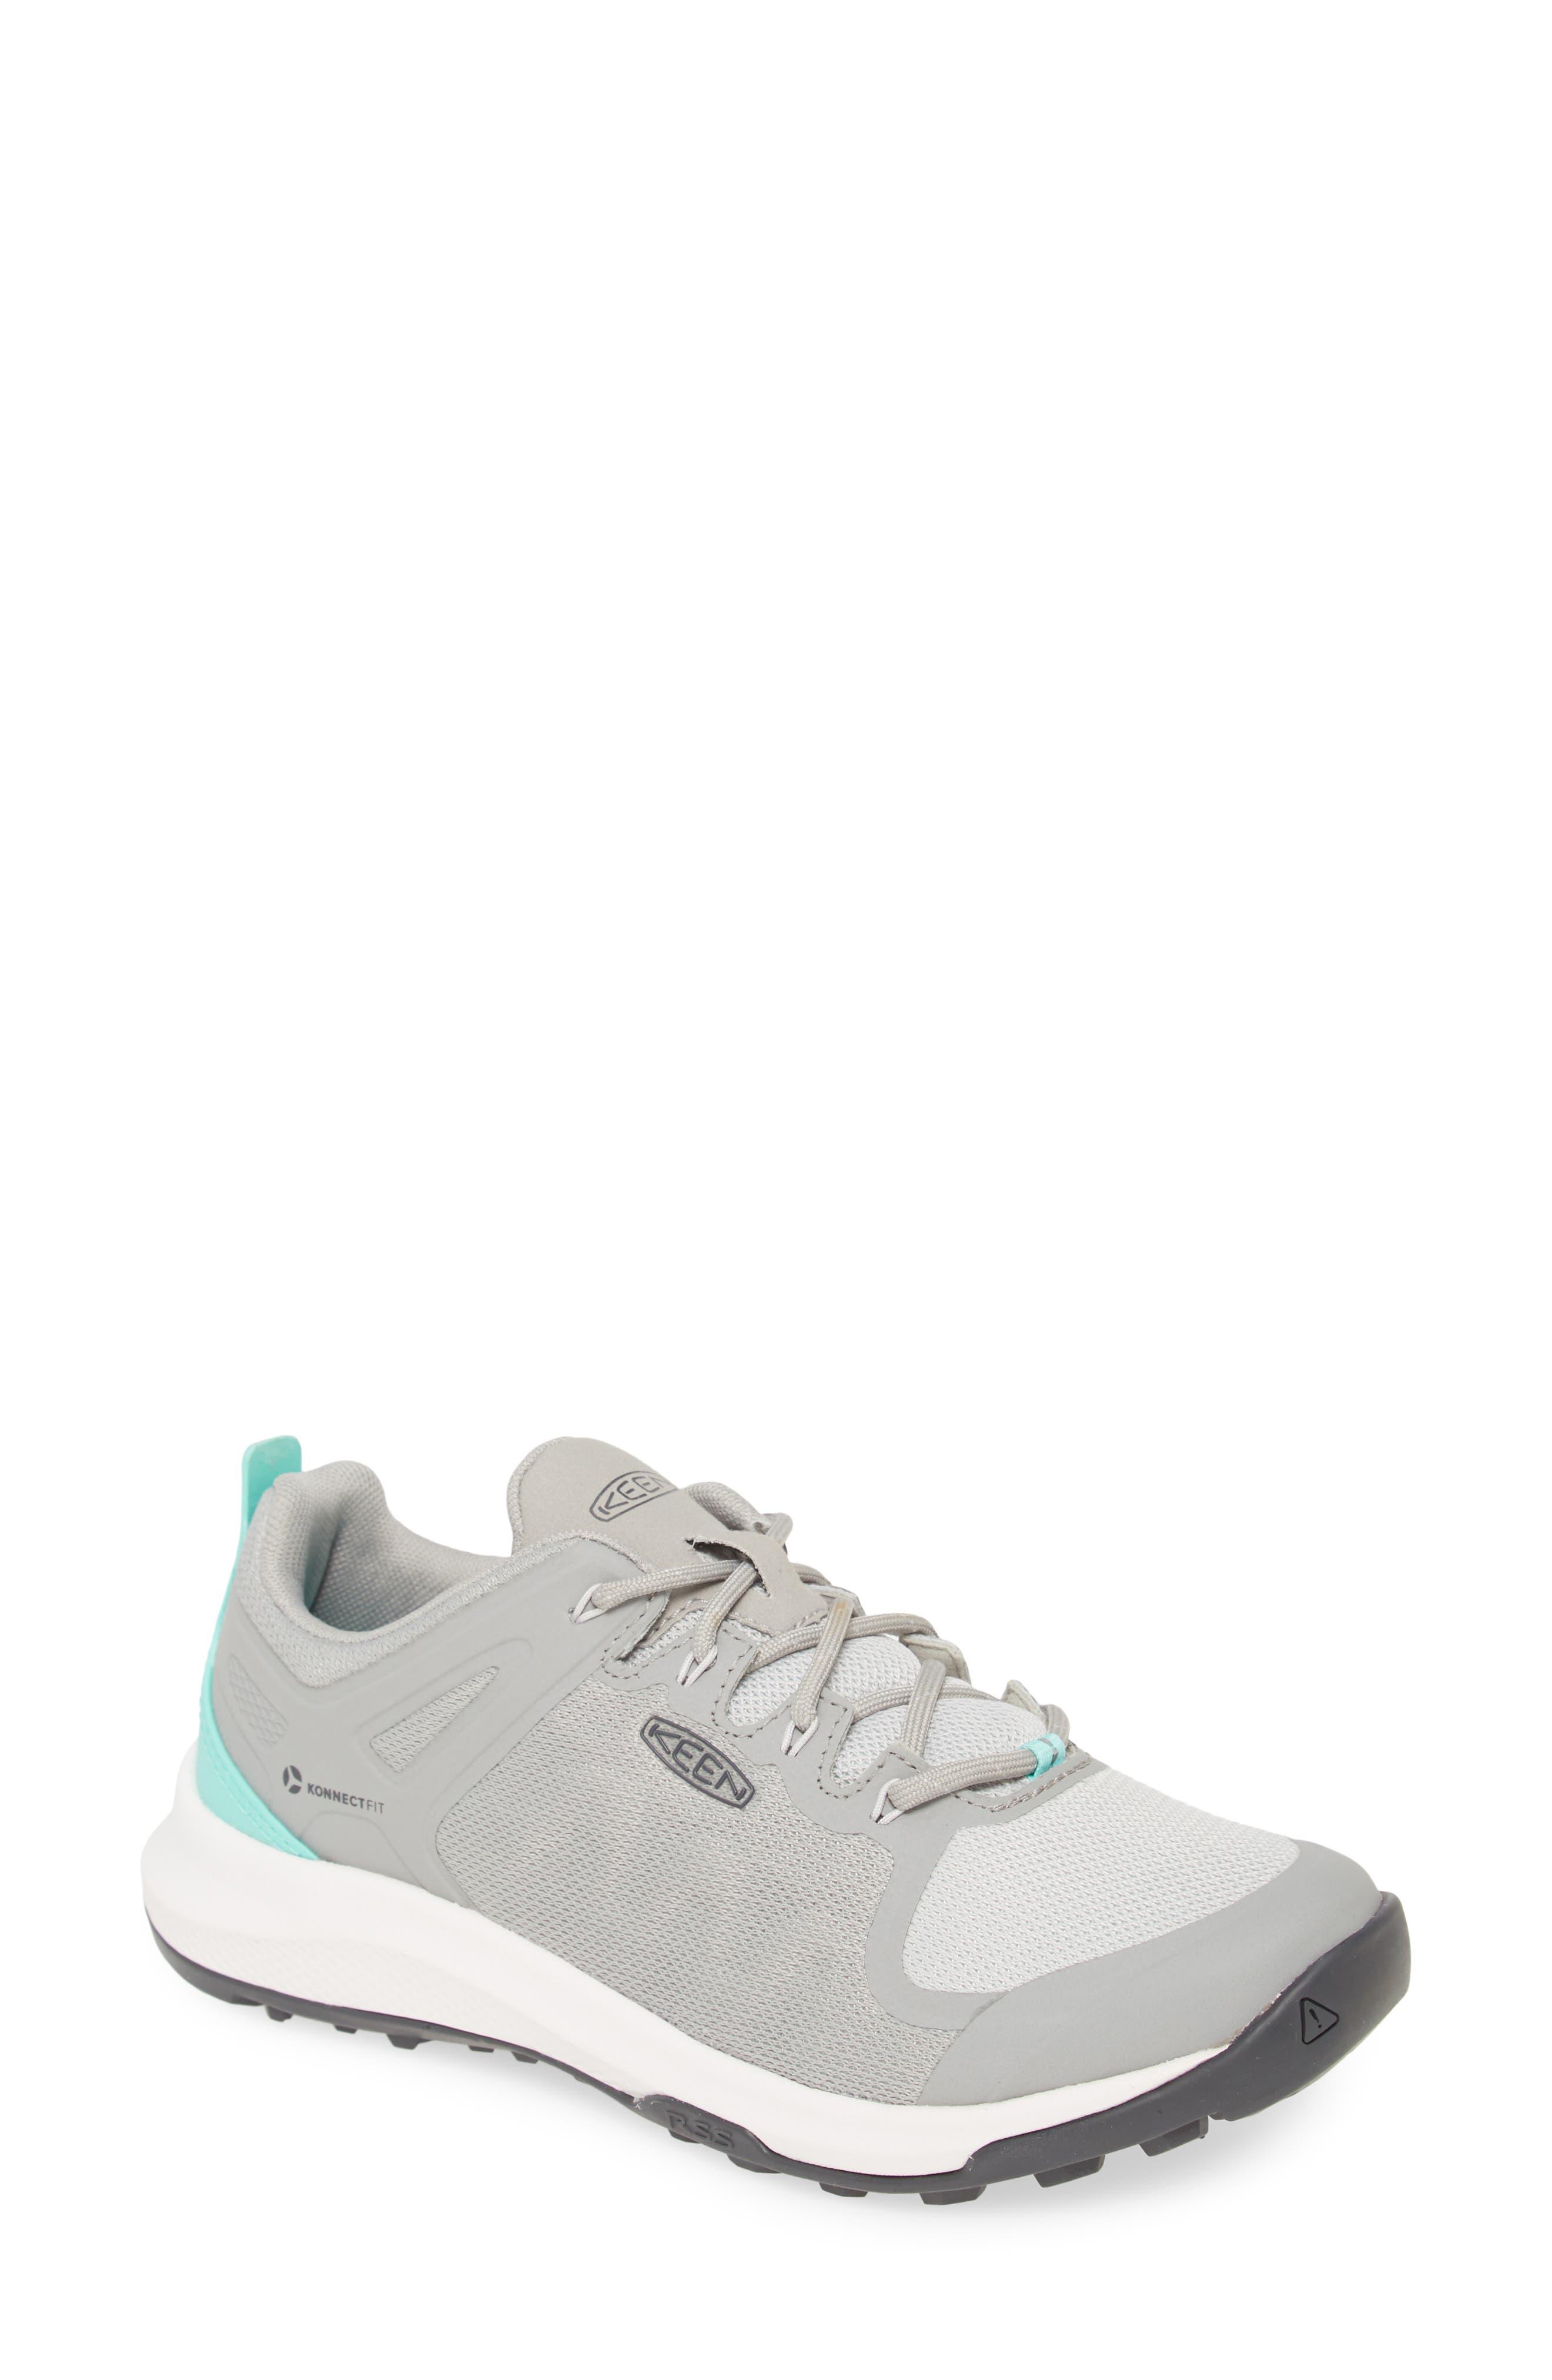 Explore Vent Sneaker